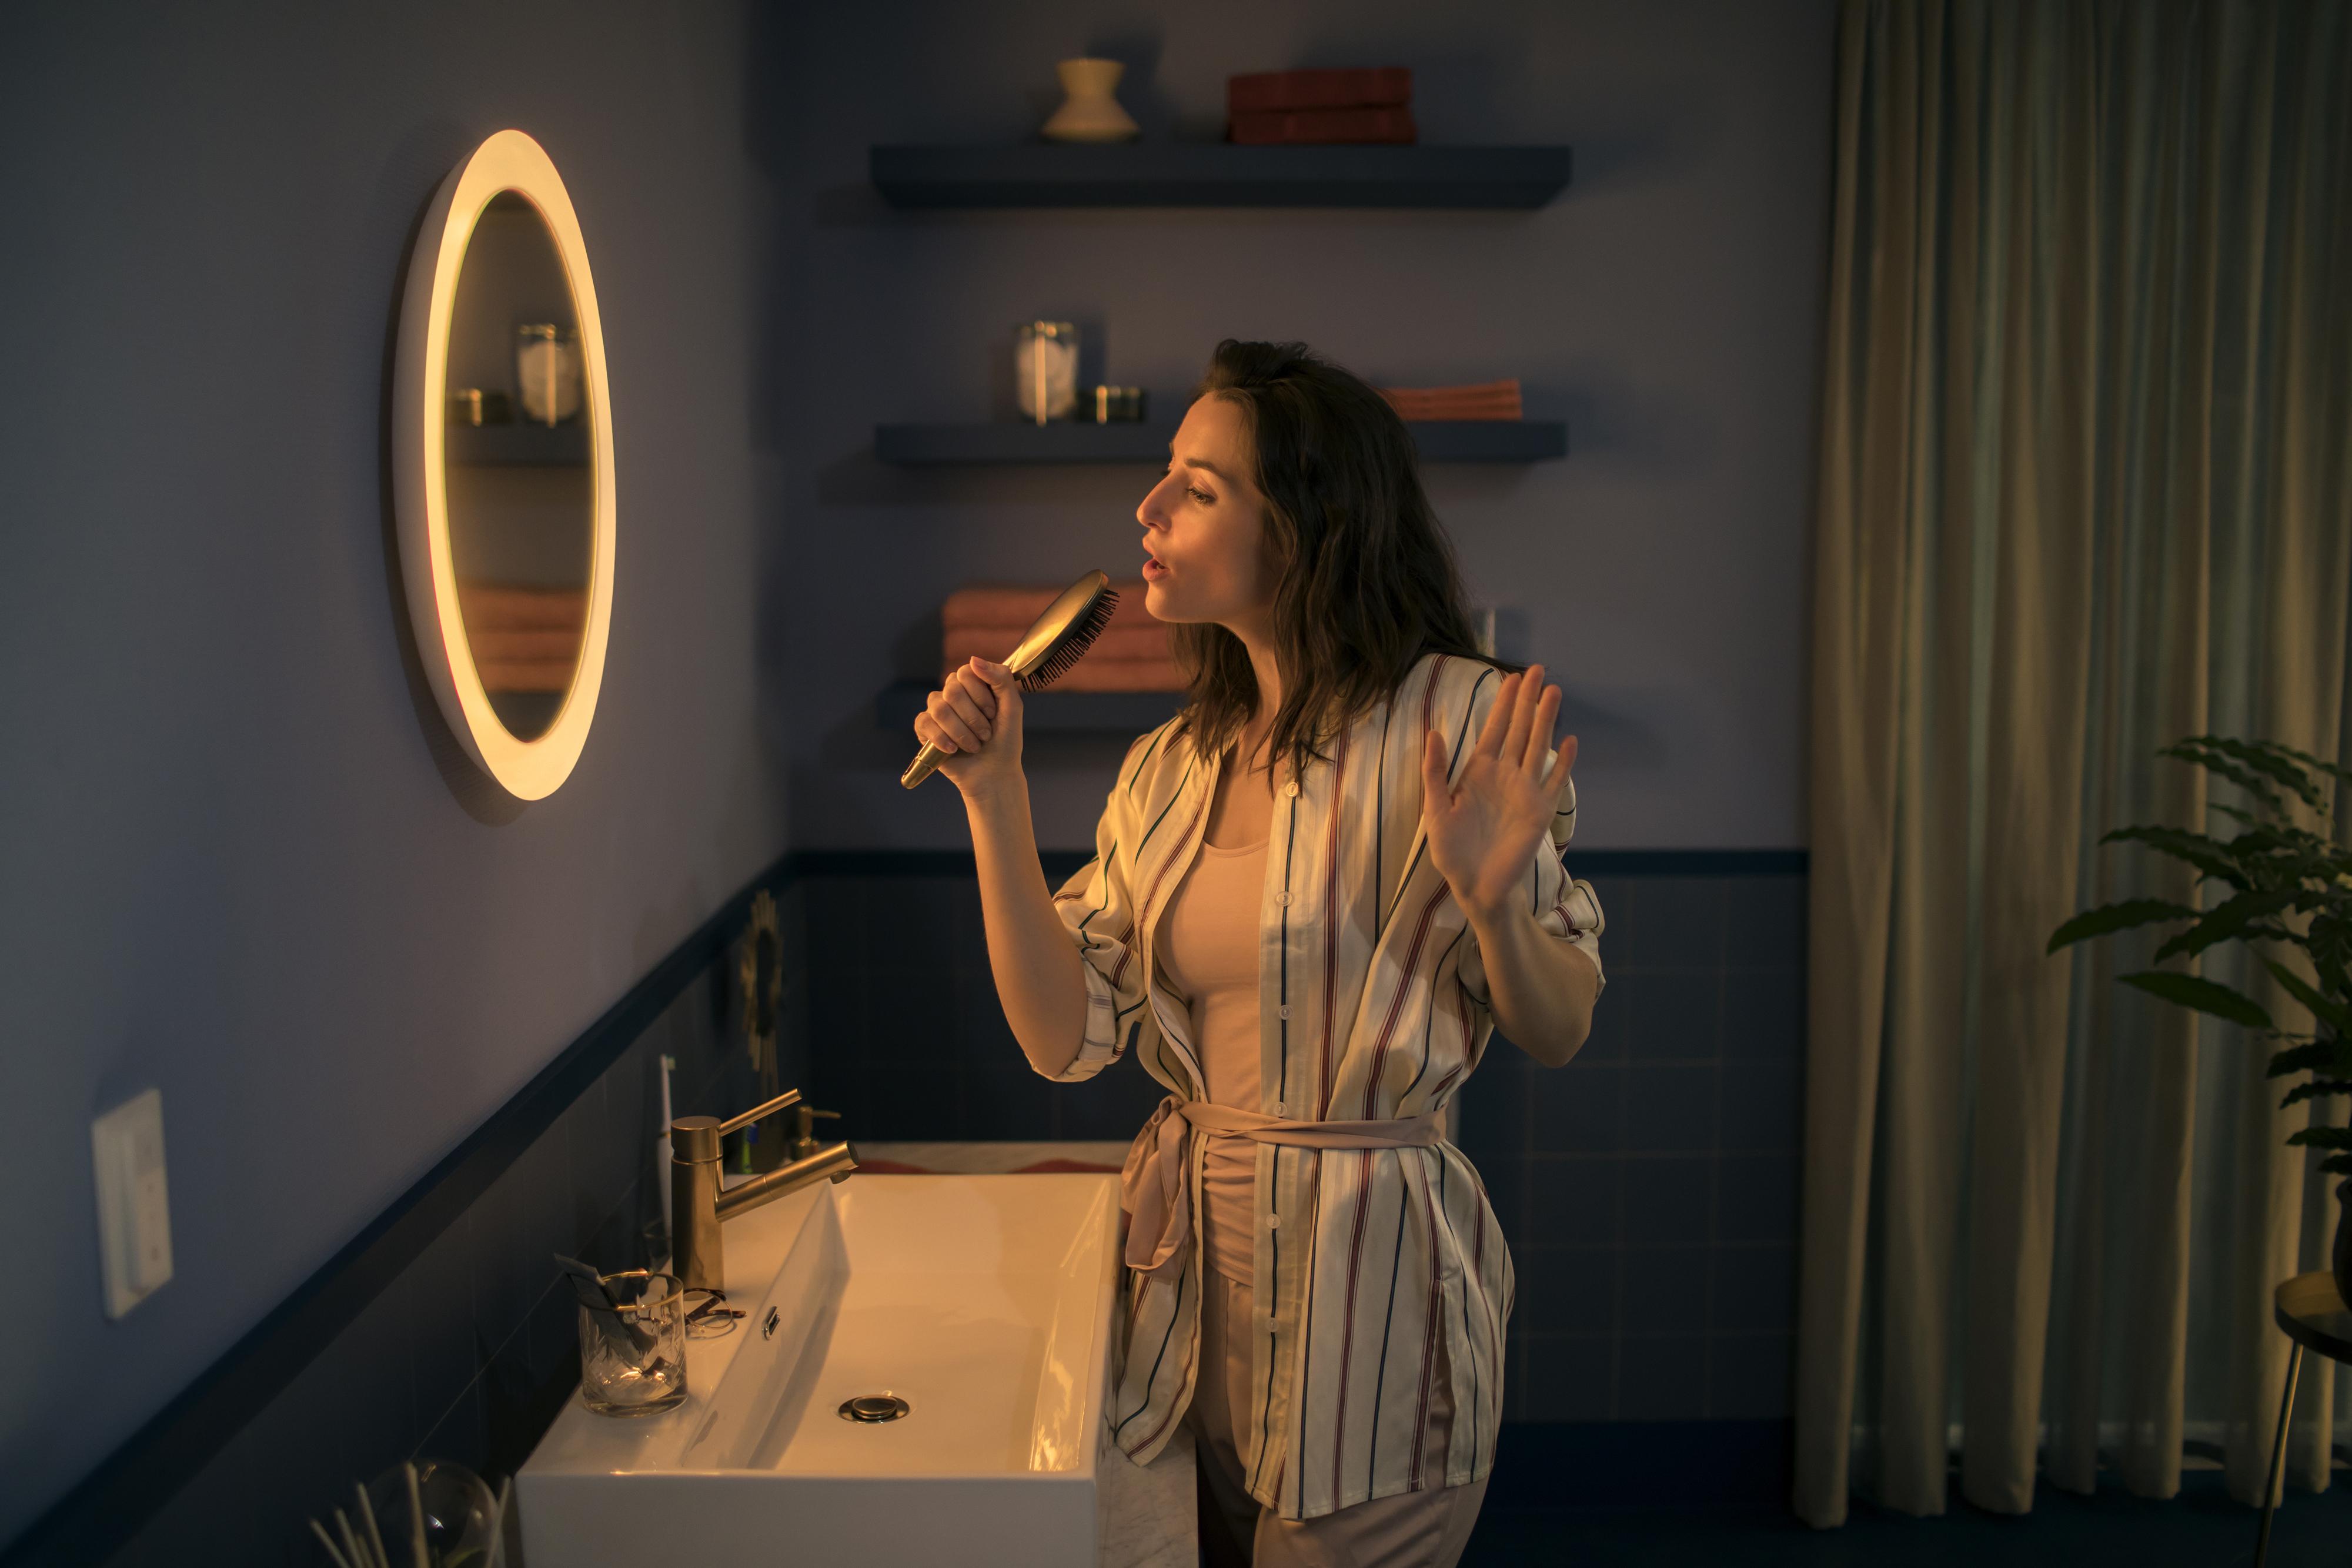 Neue Philips Hue Badezimmer-Kollektion Ab Sofort Im Handel